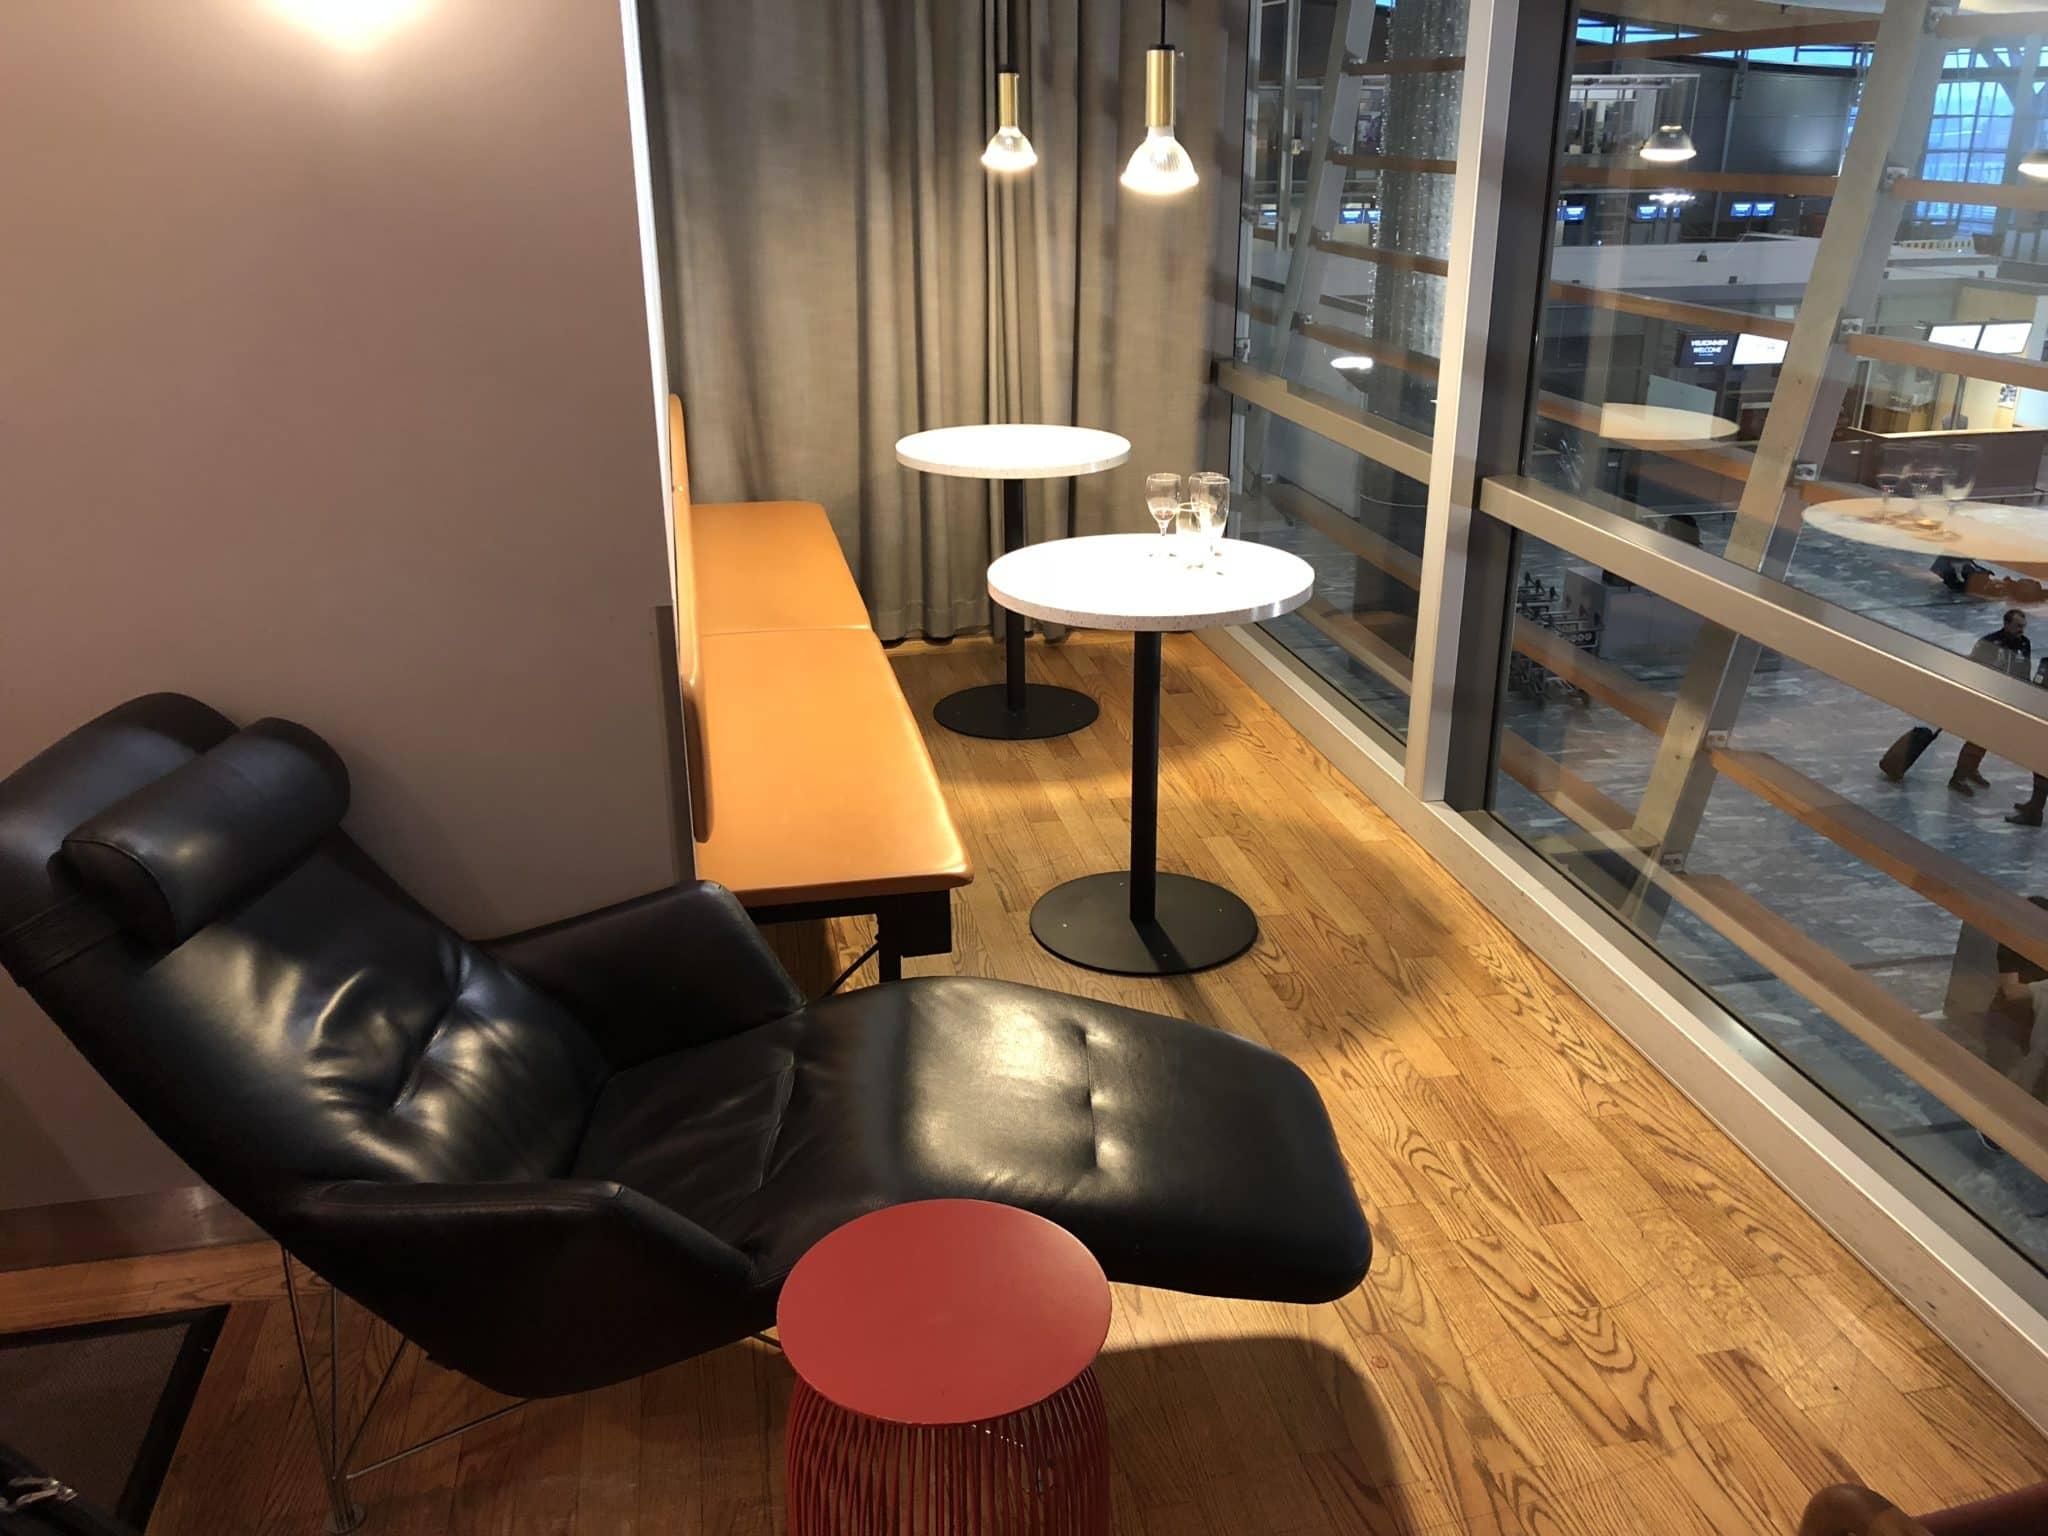 SAS Gold Lounge Oslo-Gardermoen Liege